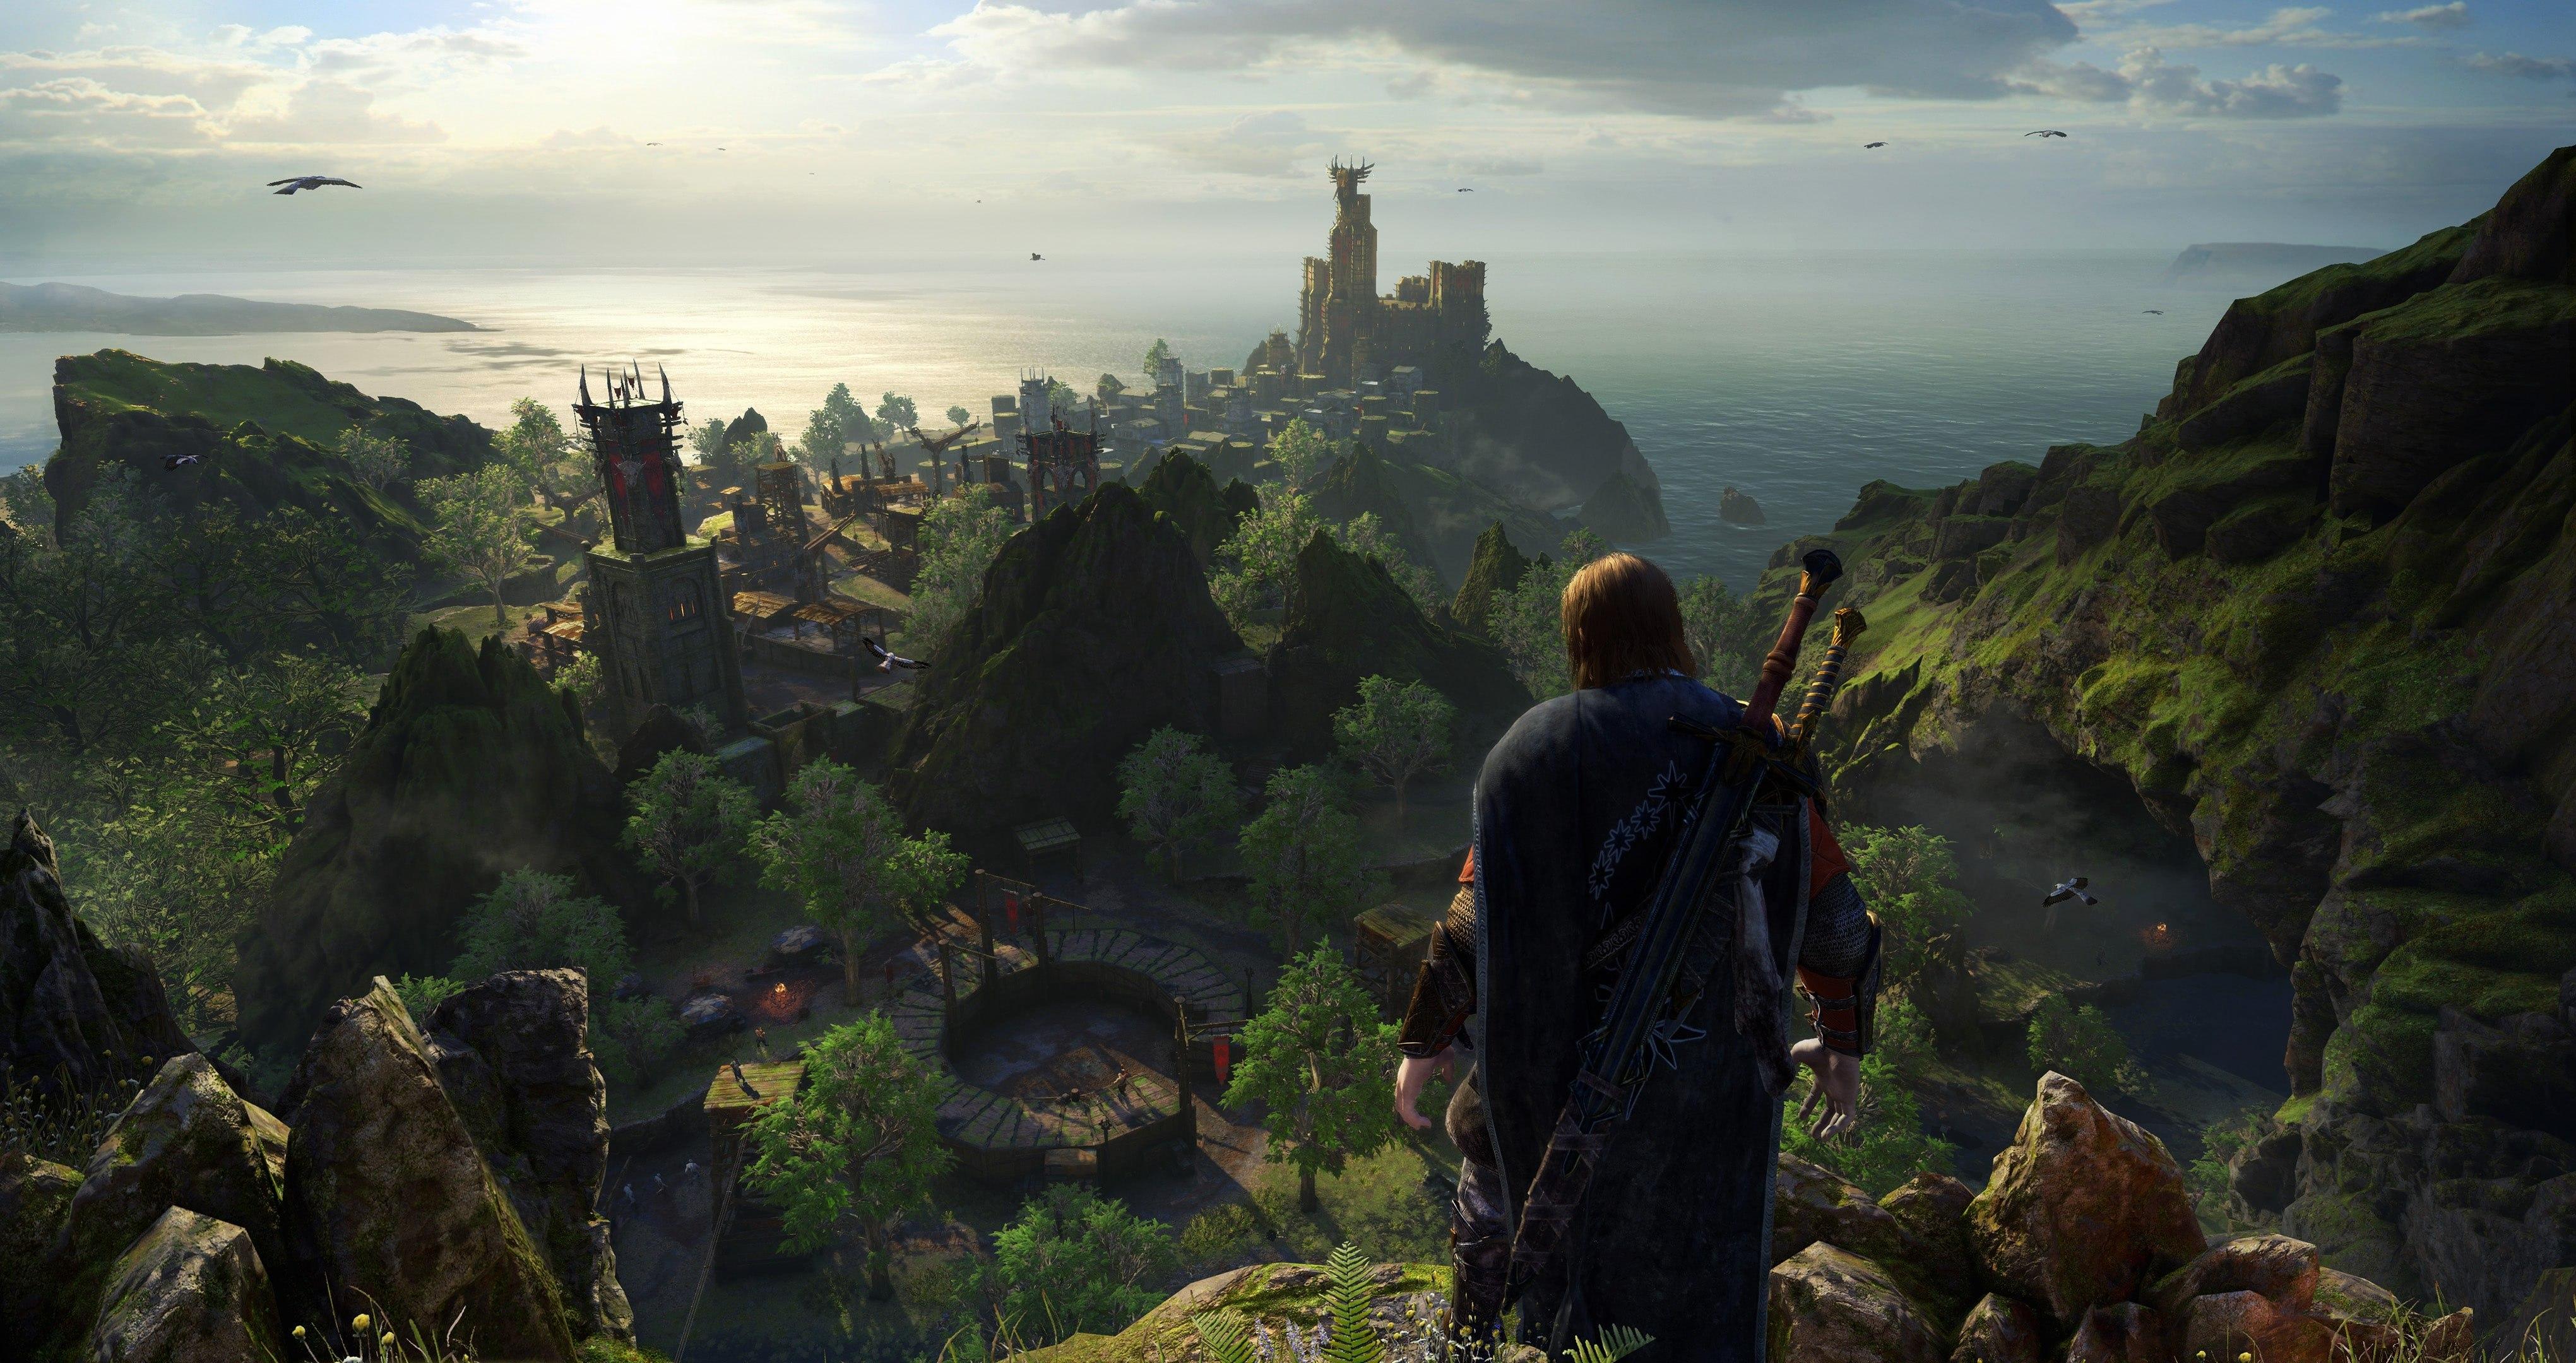 سی دی کی اریجینال استیم بازی Middle-earth: Shadow Of War - Definitive Edition